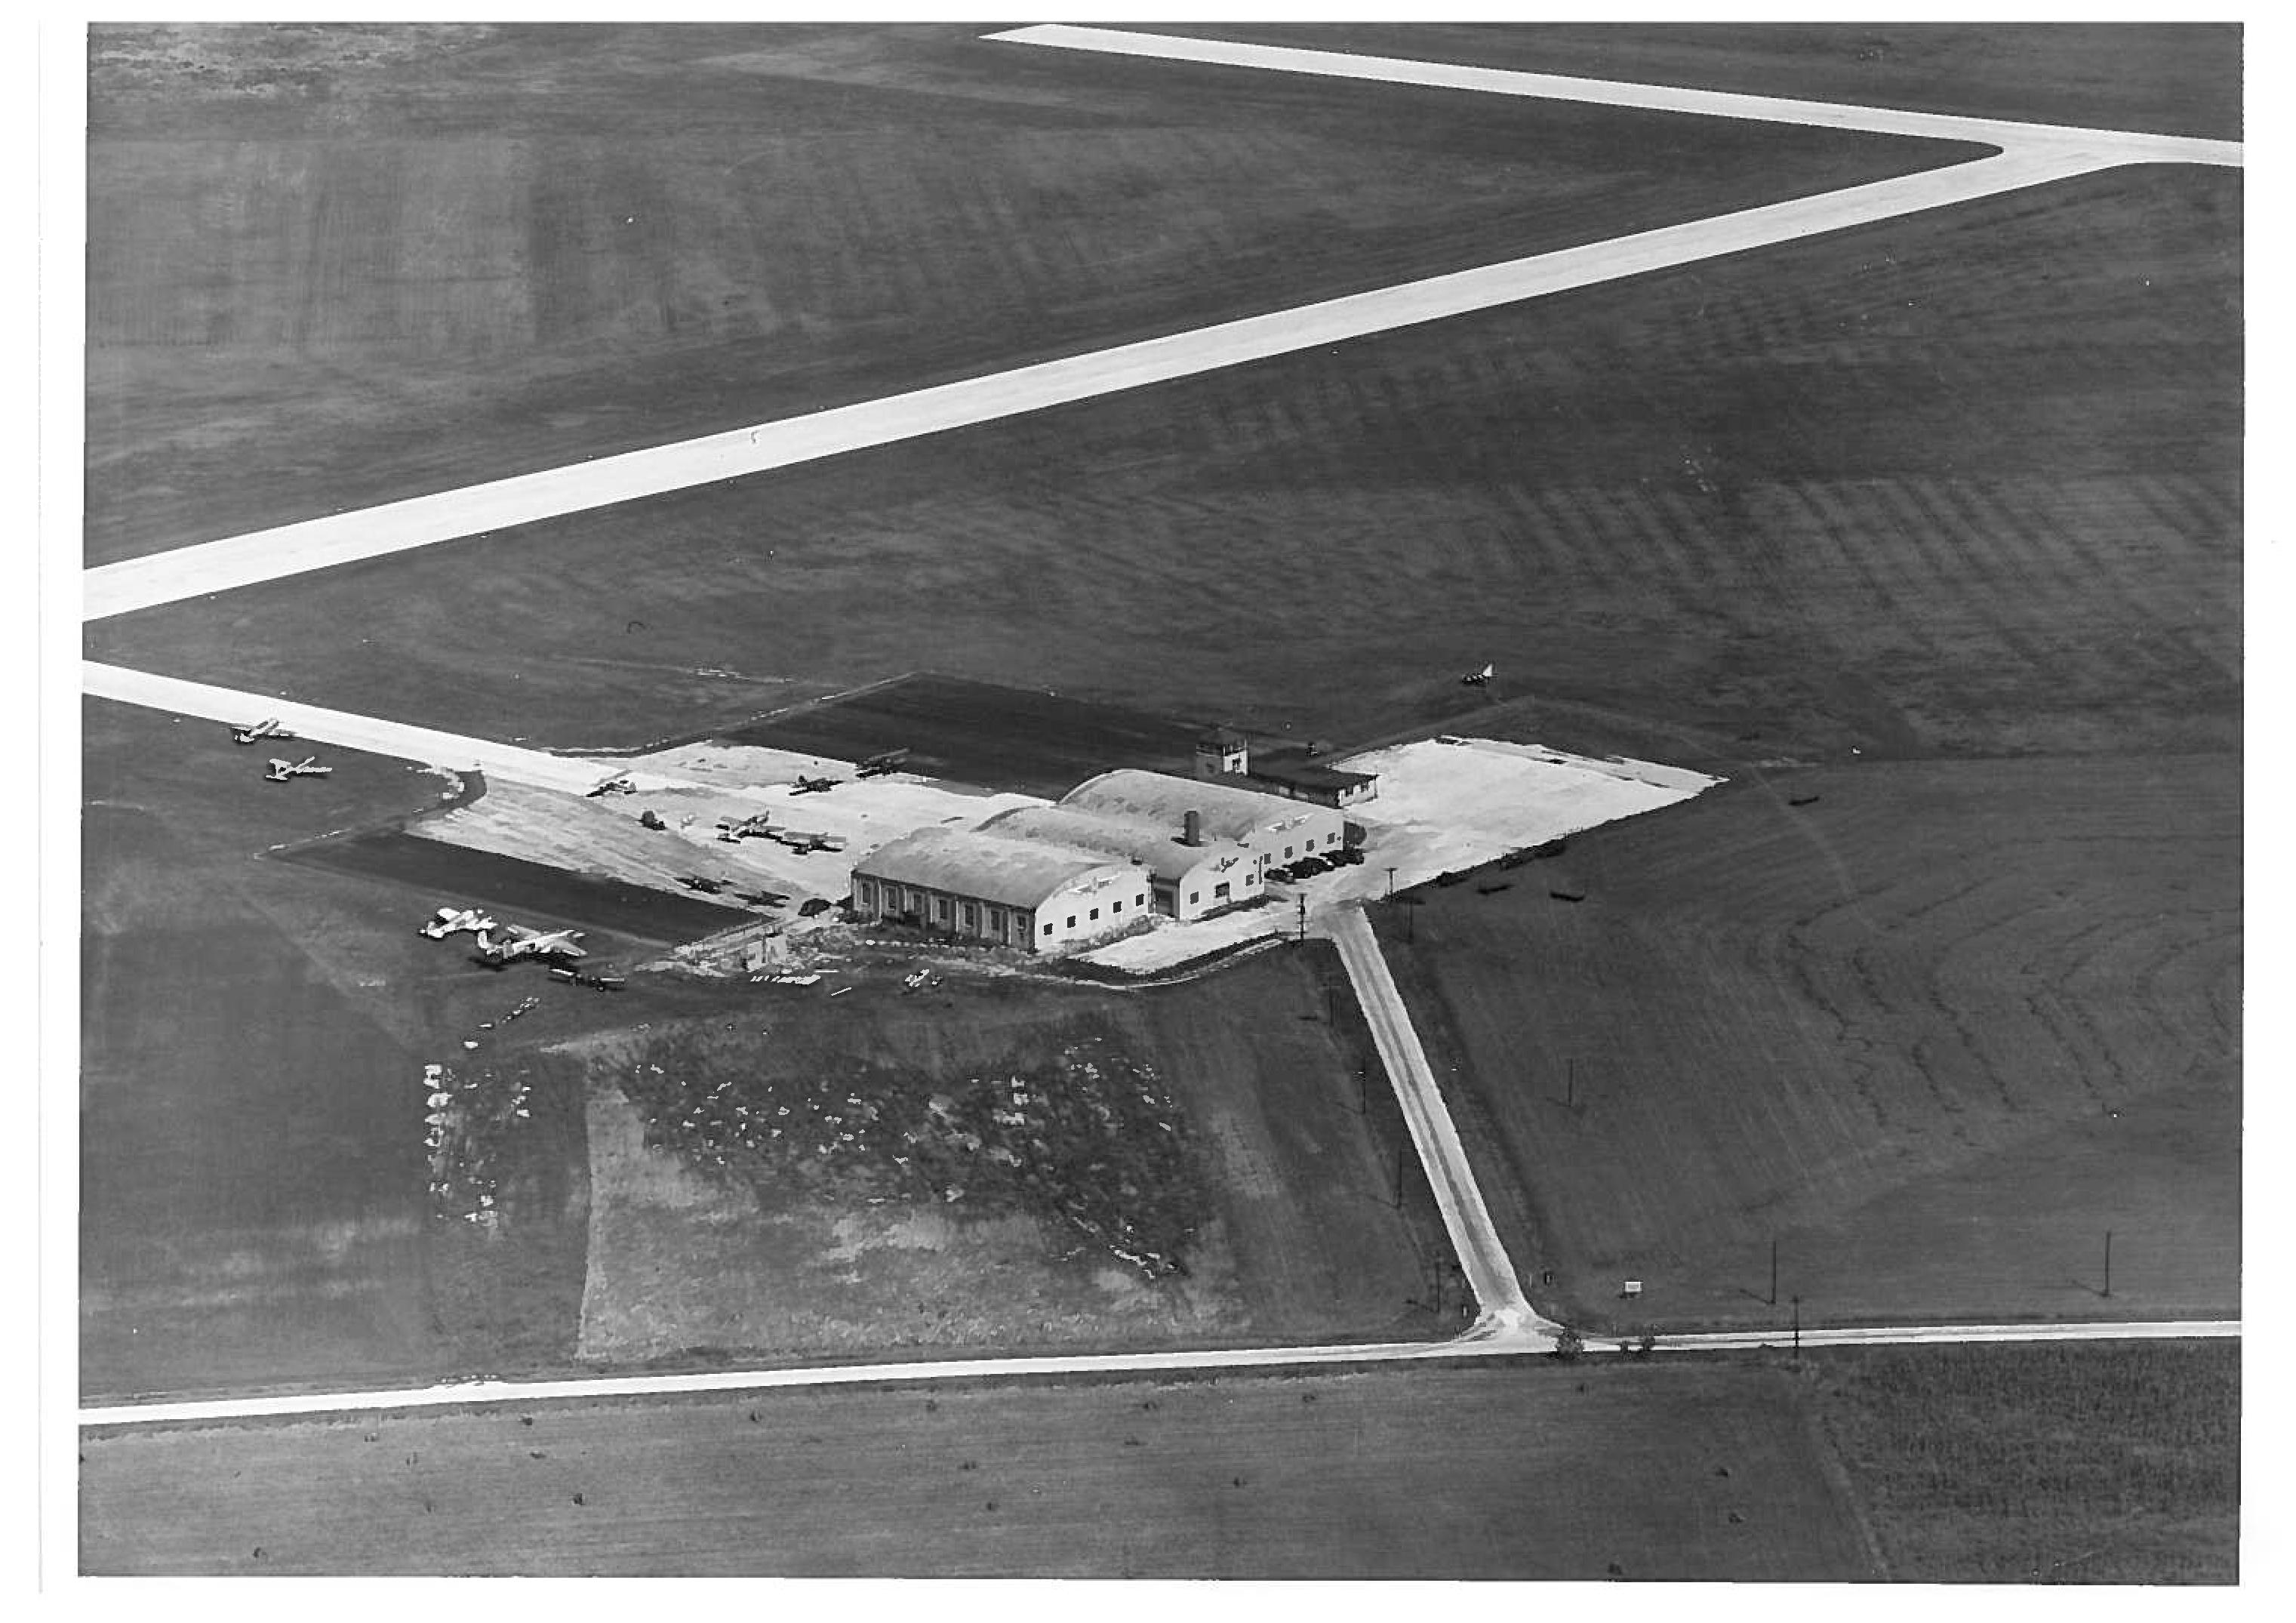 University Airport, circa 1945-46